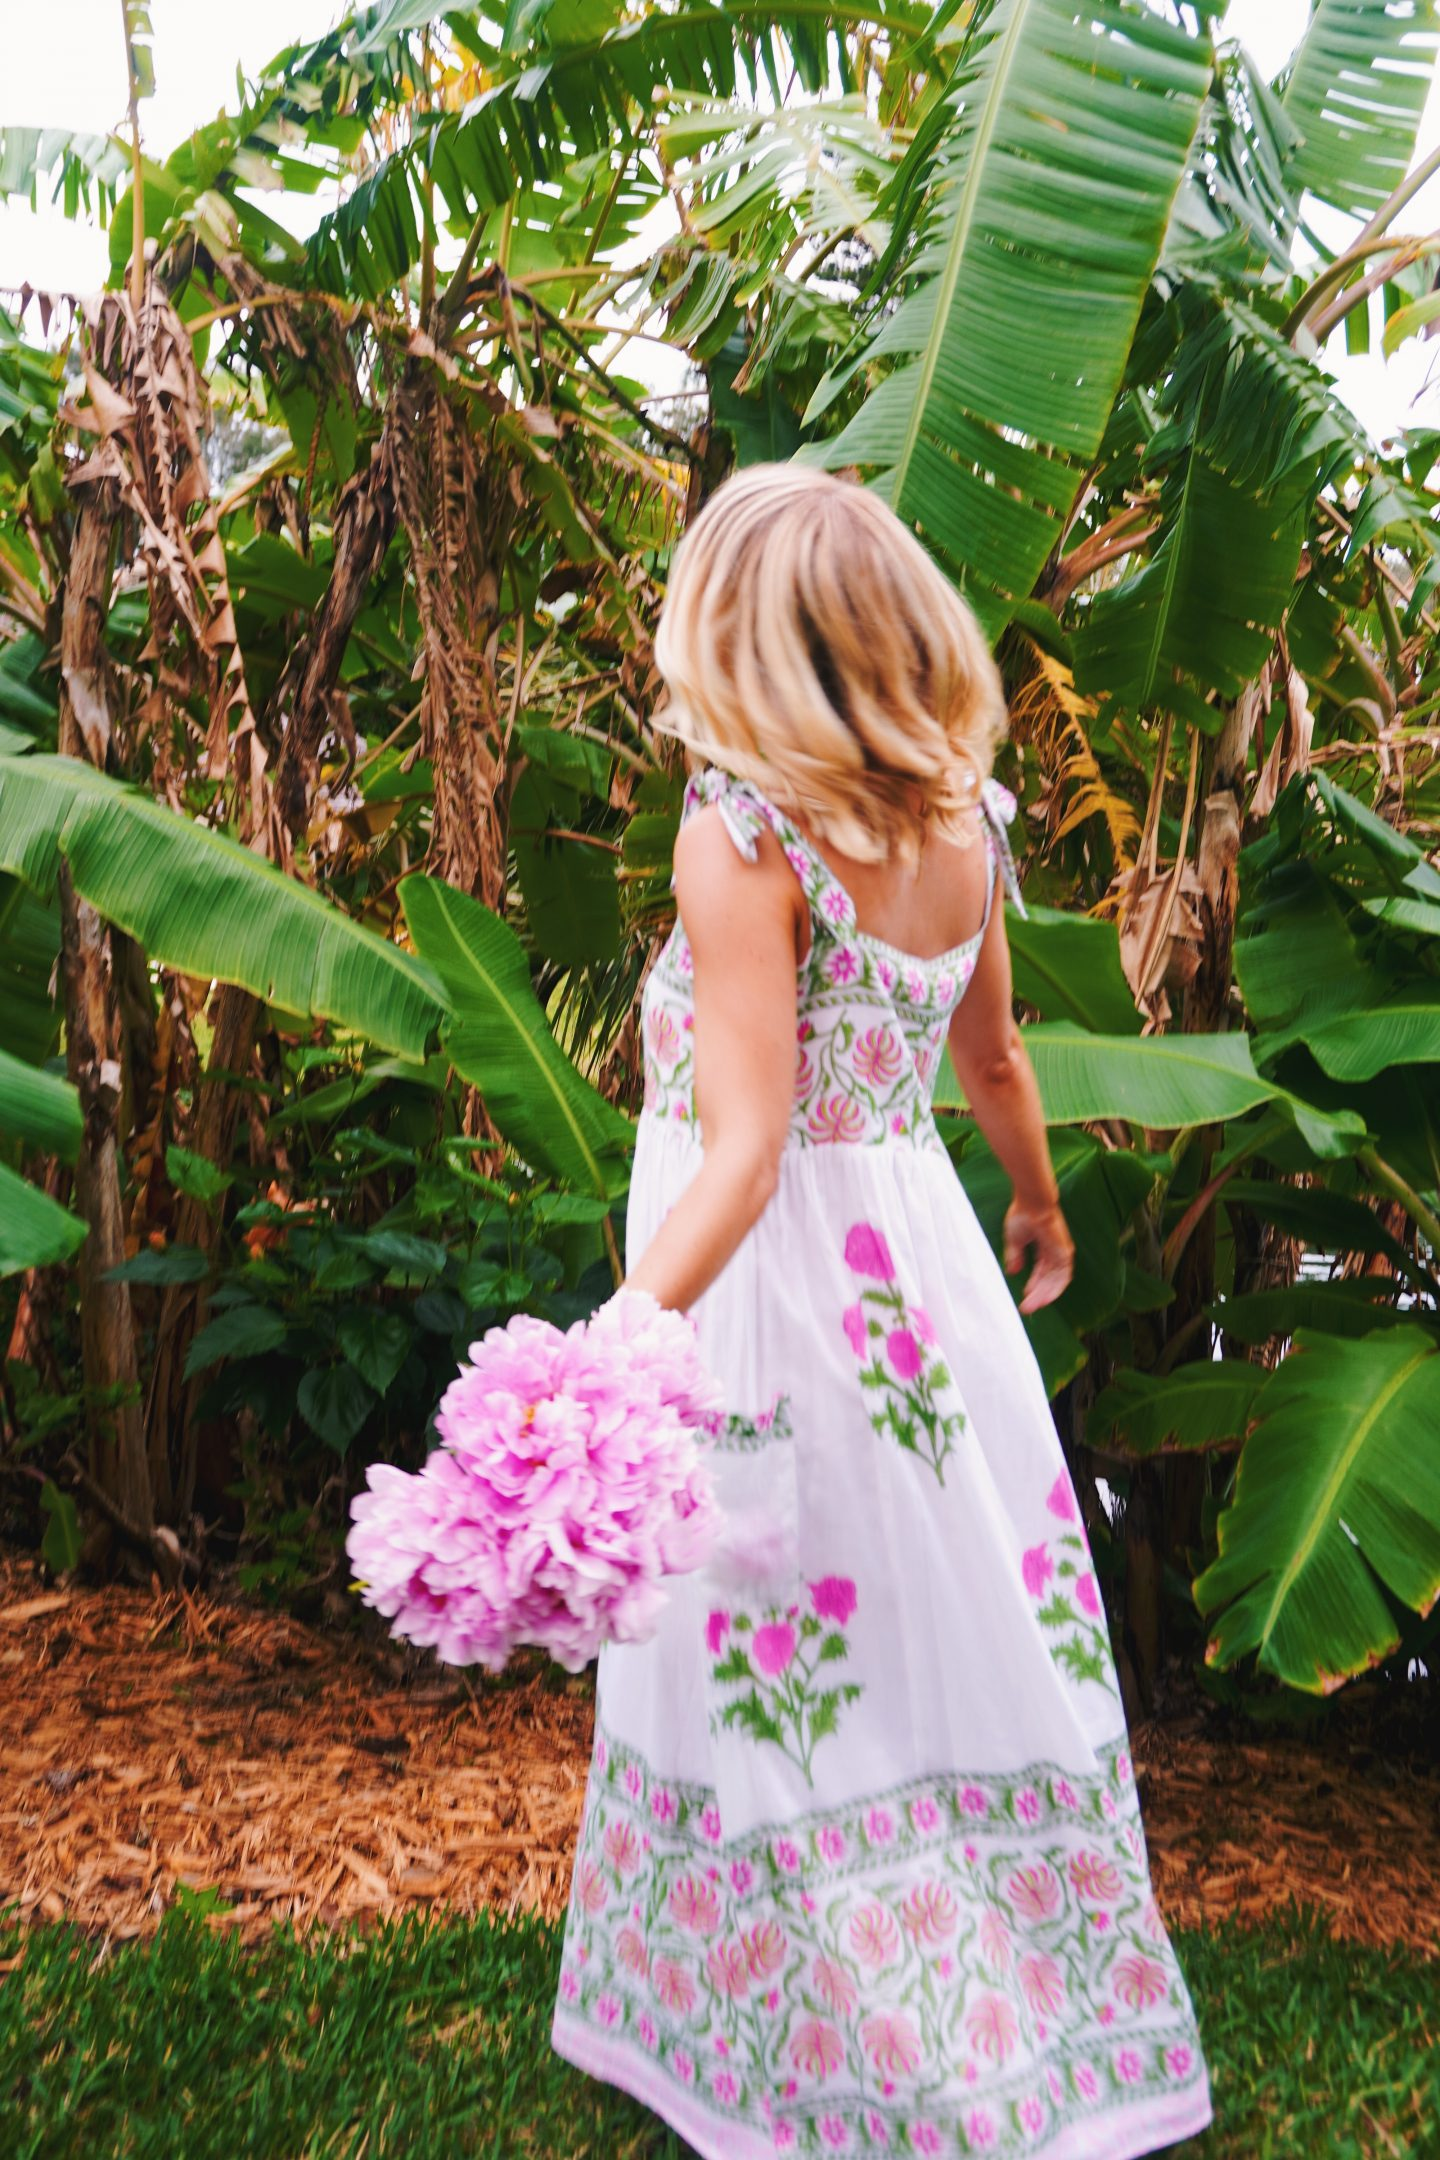 Life Lately: 2.5.20 | Juliet Dunn block print cotton tie dress in Vero Beach, FL